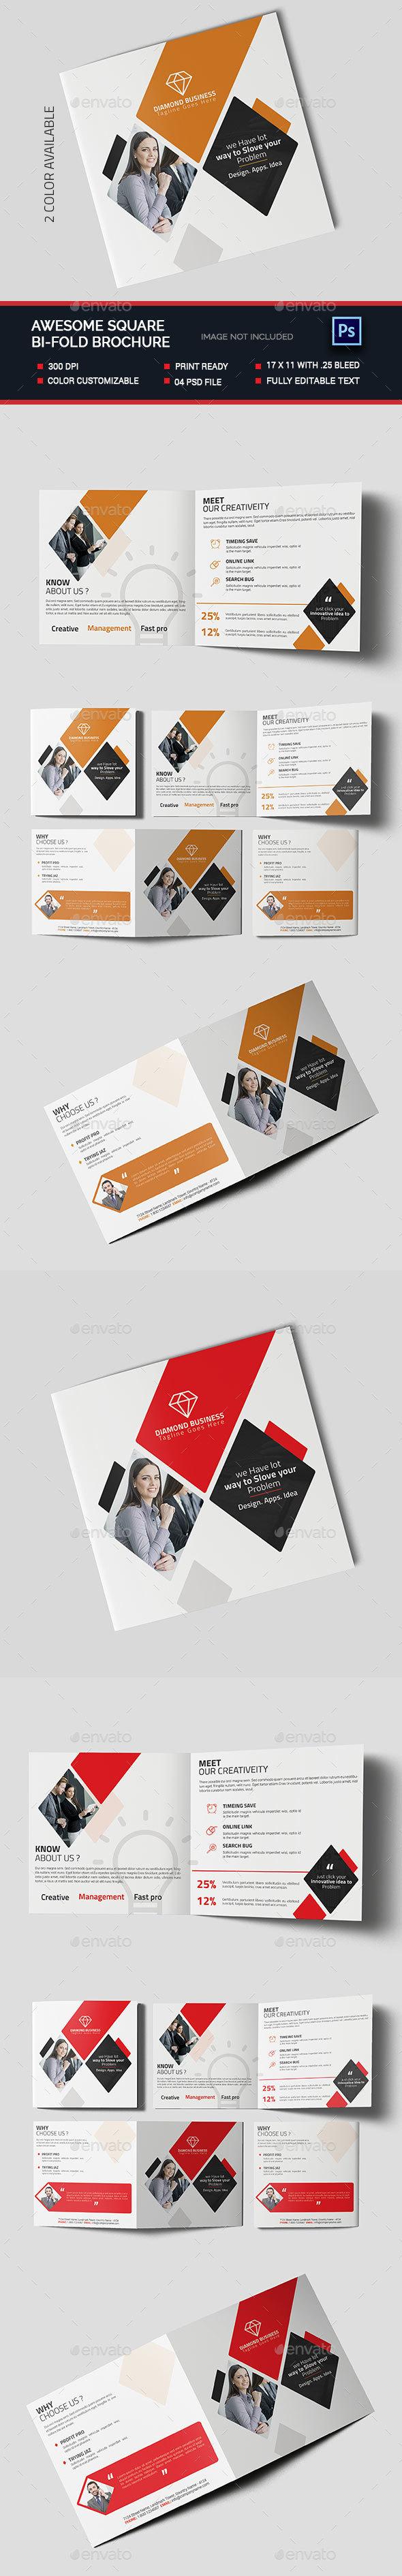 Awesome Square Bi-fold Brochure  - Brochures Print Templates